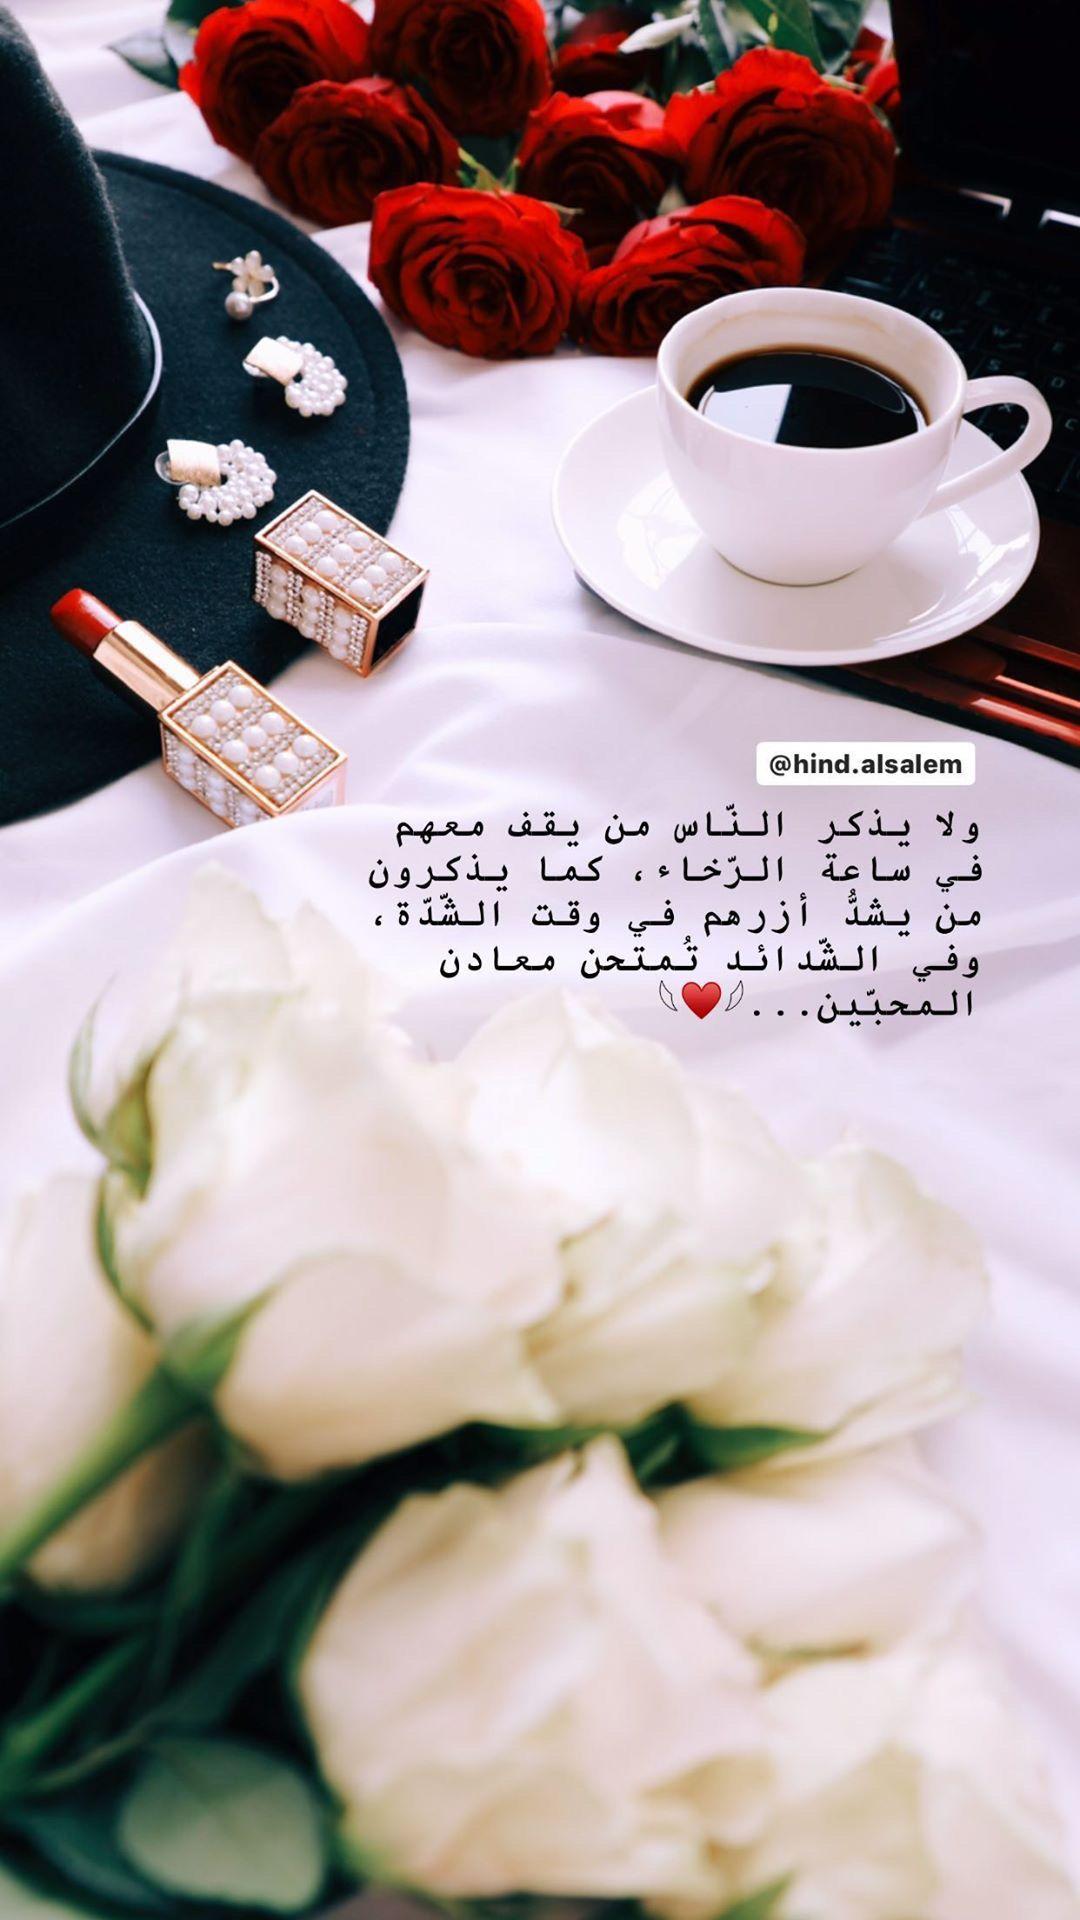 Pin By رضا العبود On افكار حلوه Arabic Love Quotes Arabic Quotes Coconut Flakes